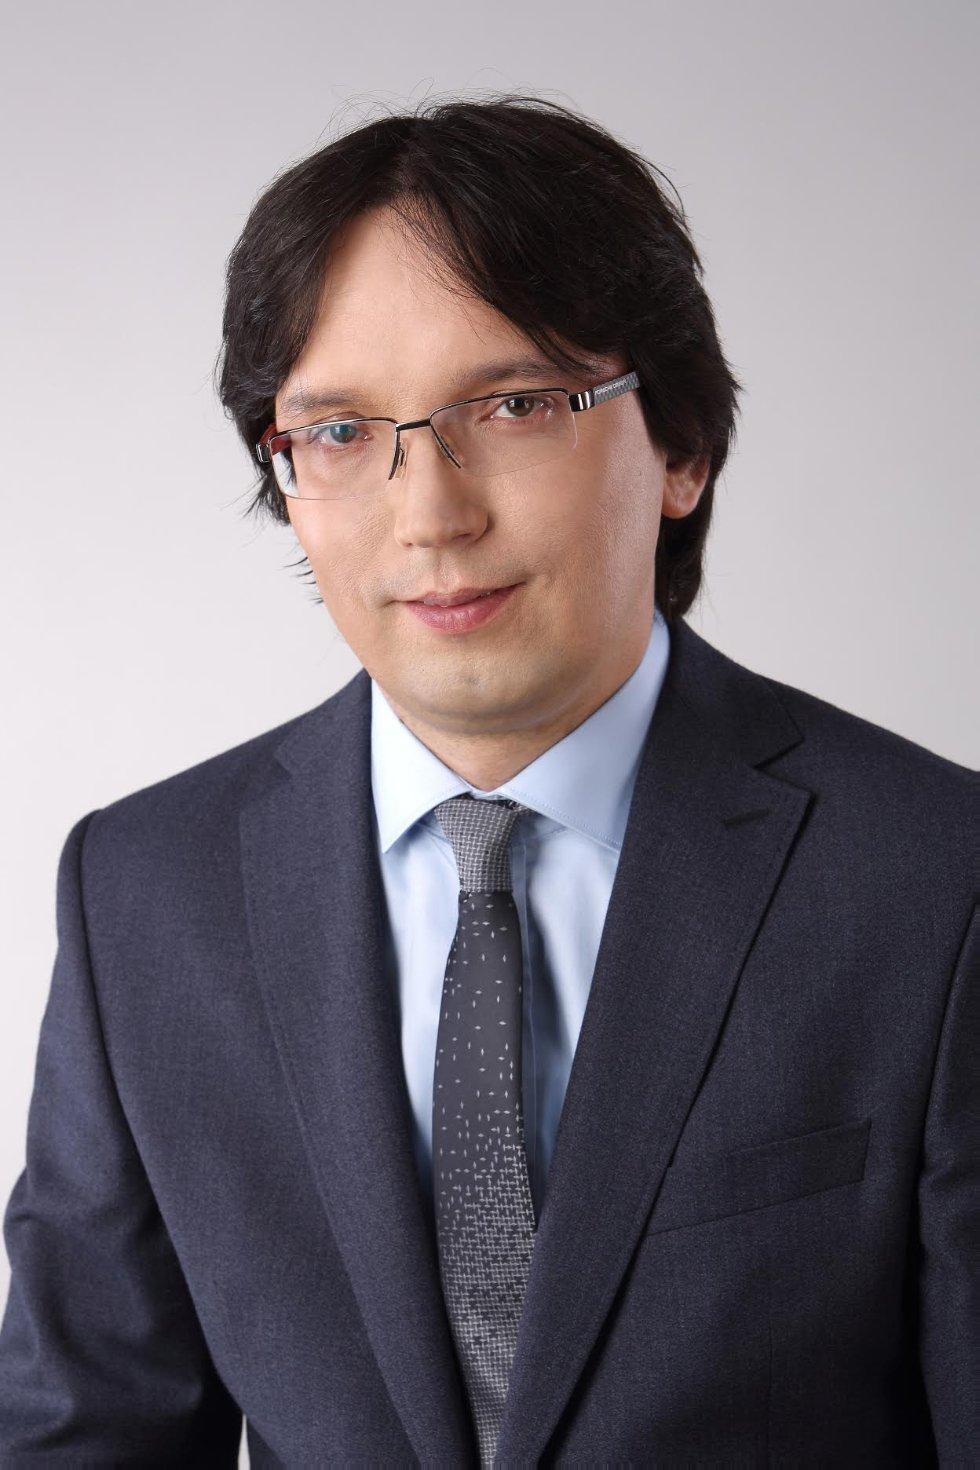 Valeev Damir Khamitovich